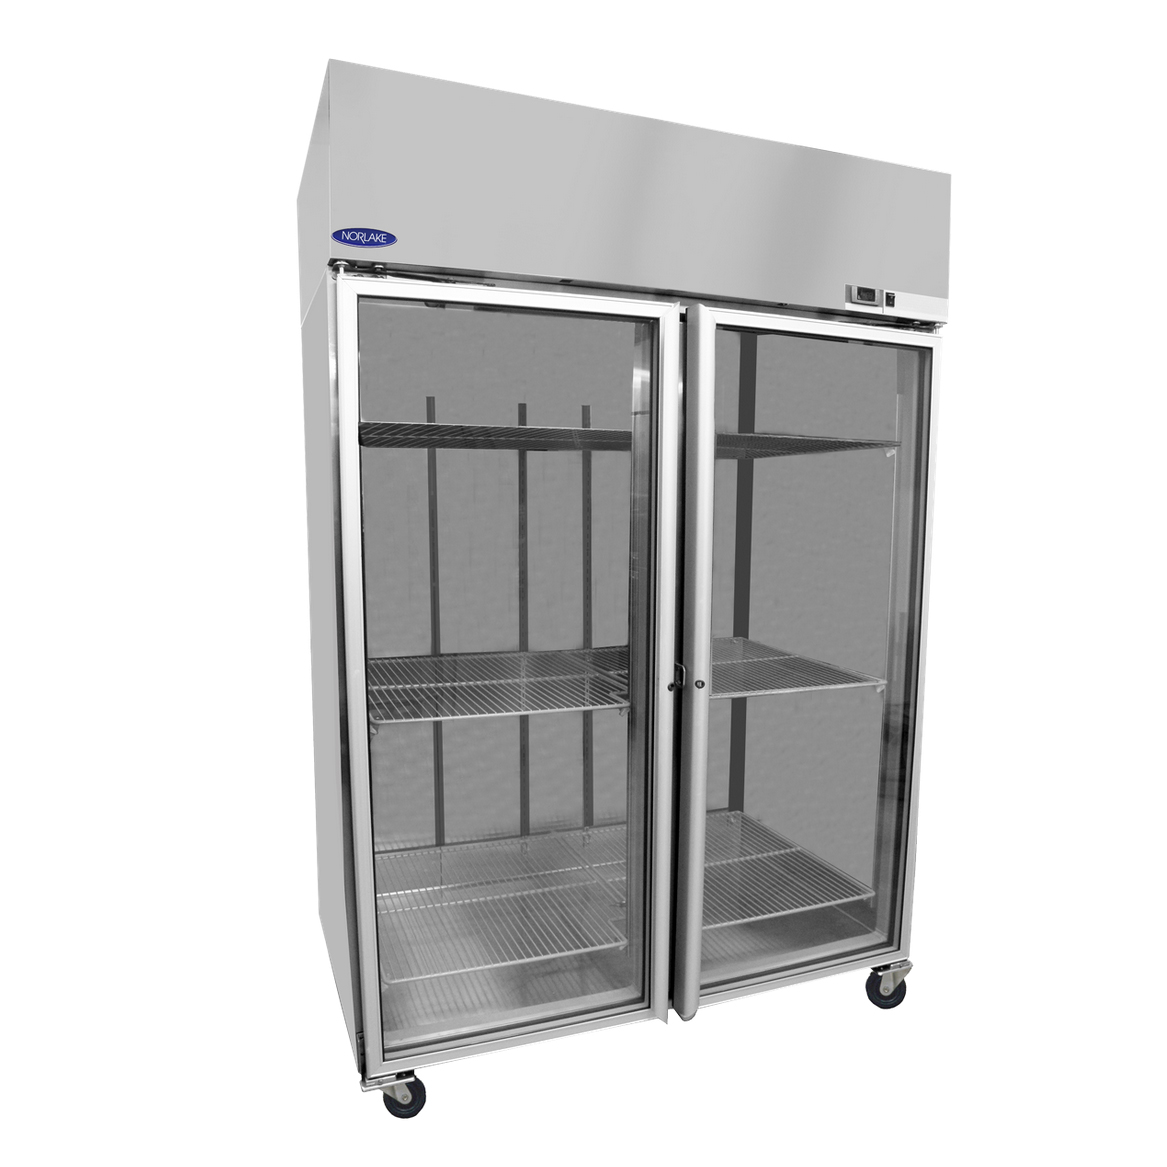 Nor-Lake NR522SSG/0 refrigerator, reach-in